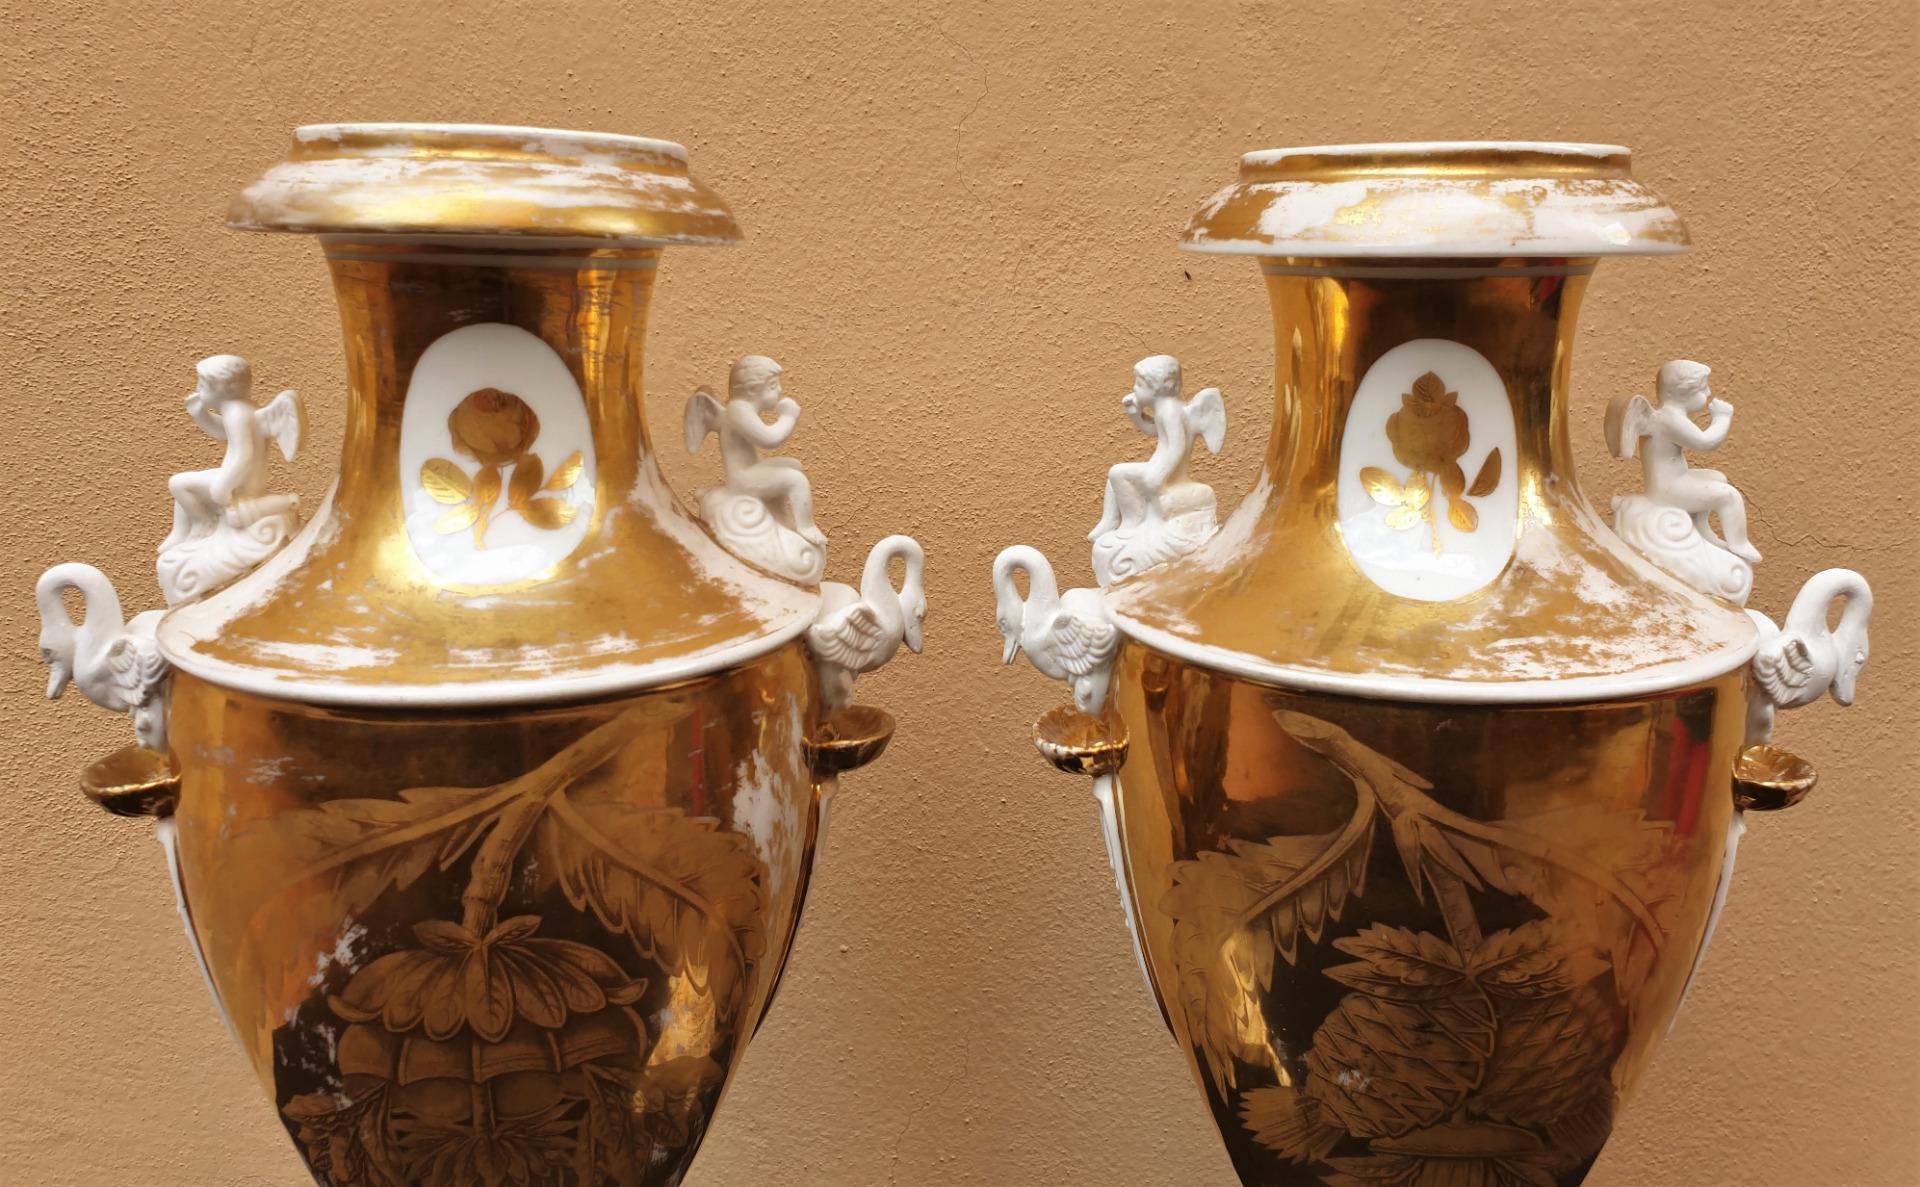 thumb2|一对帝国双耳瓶